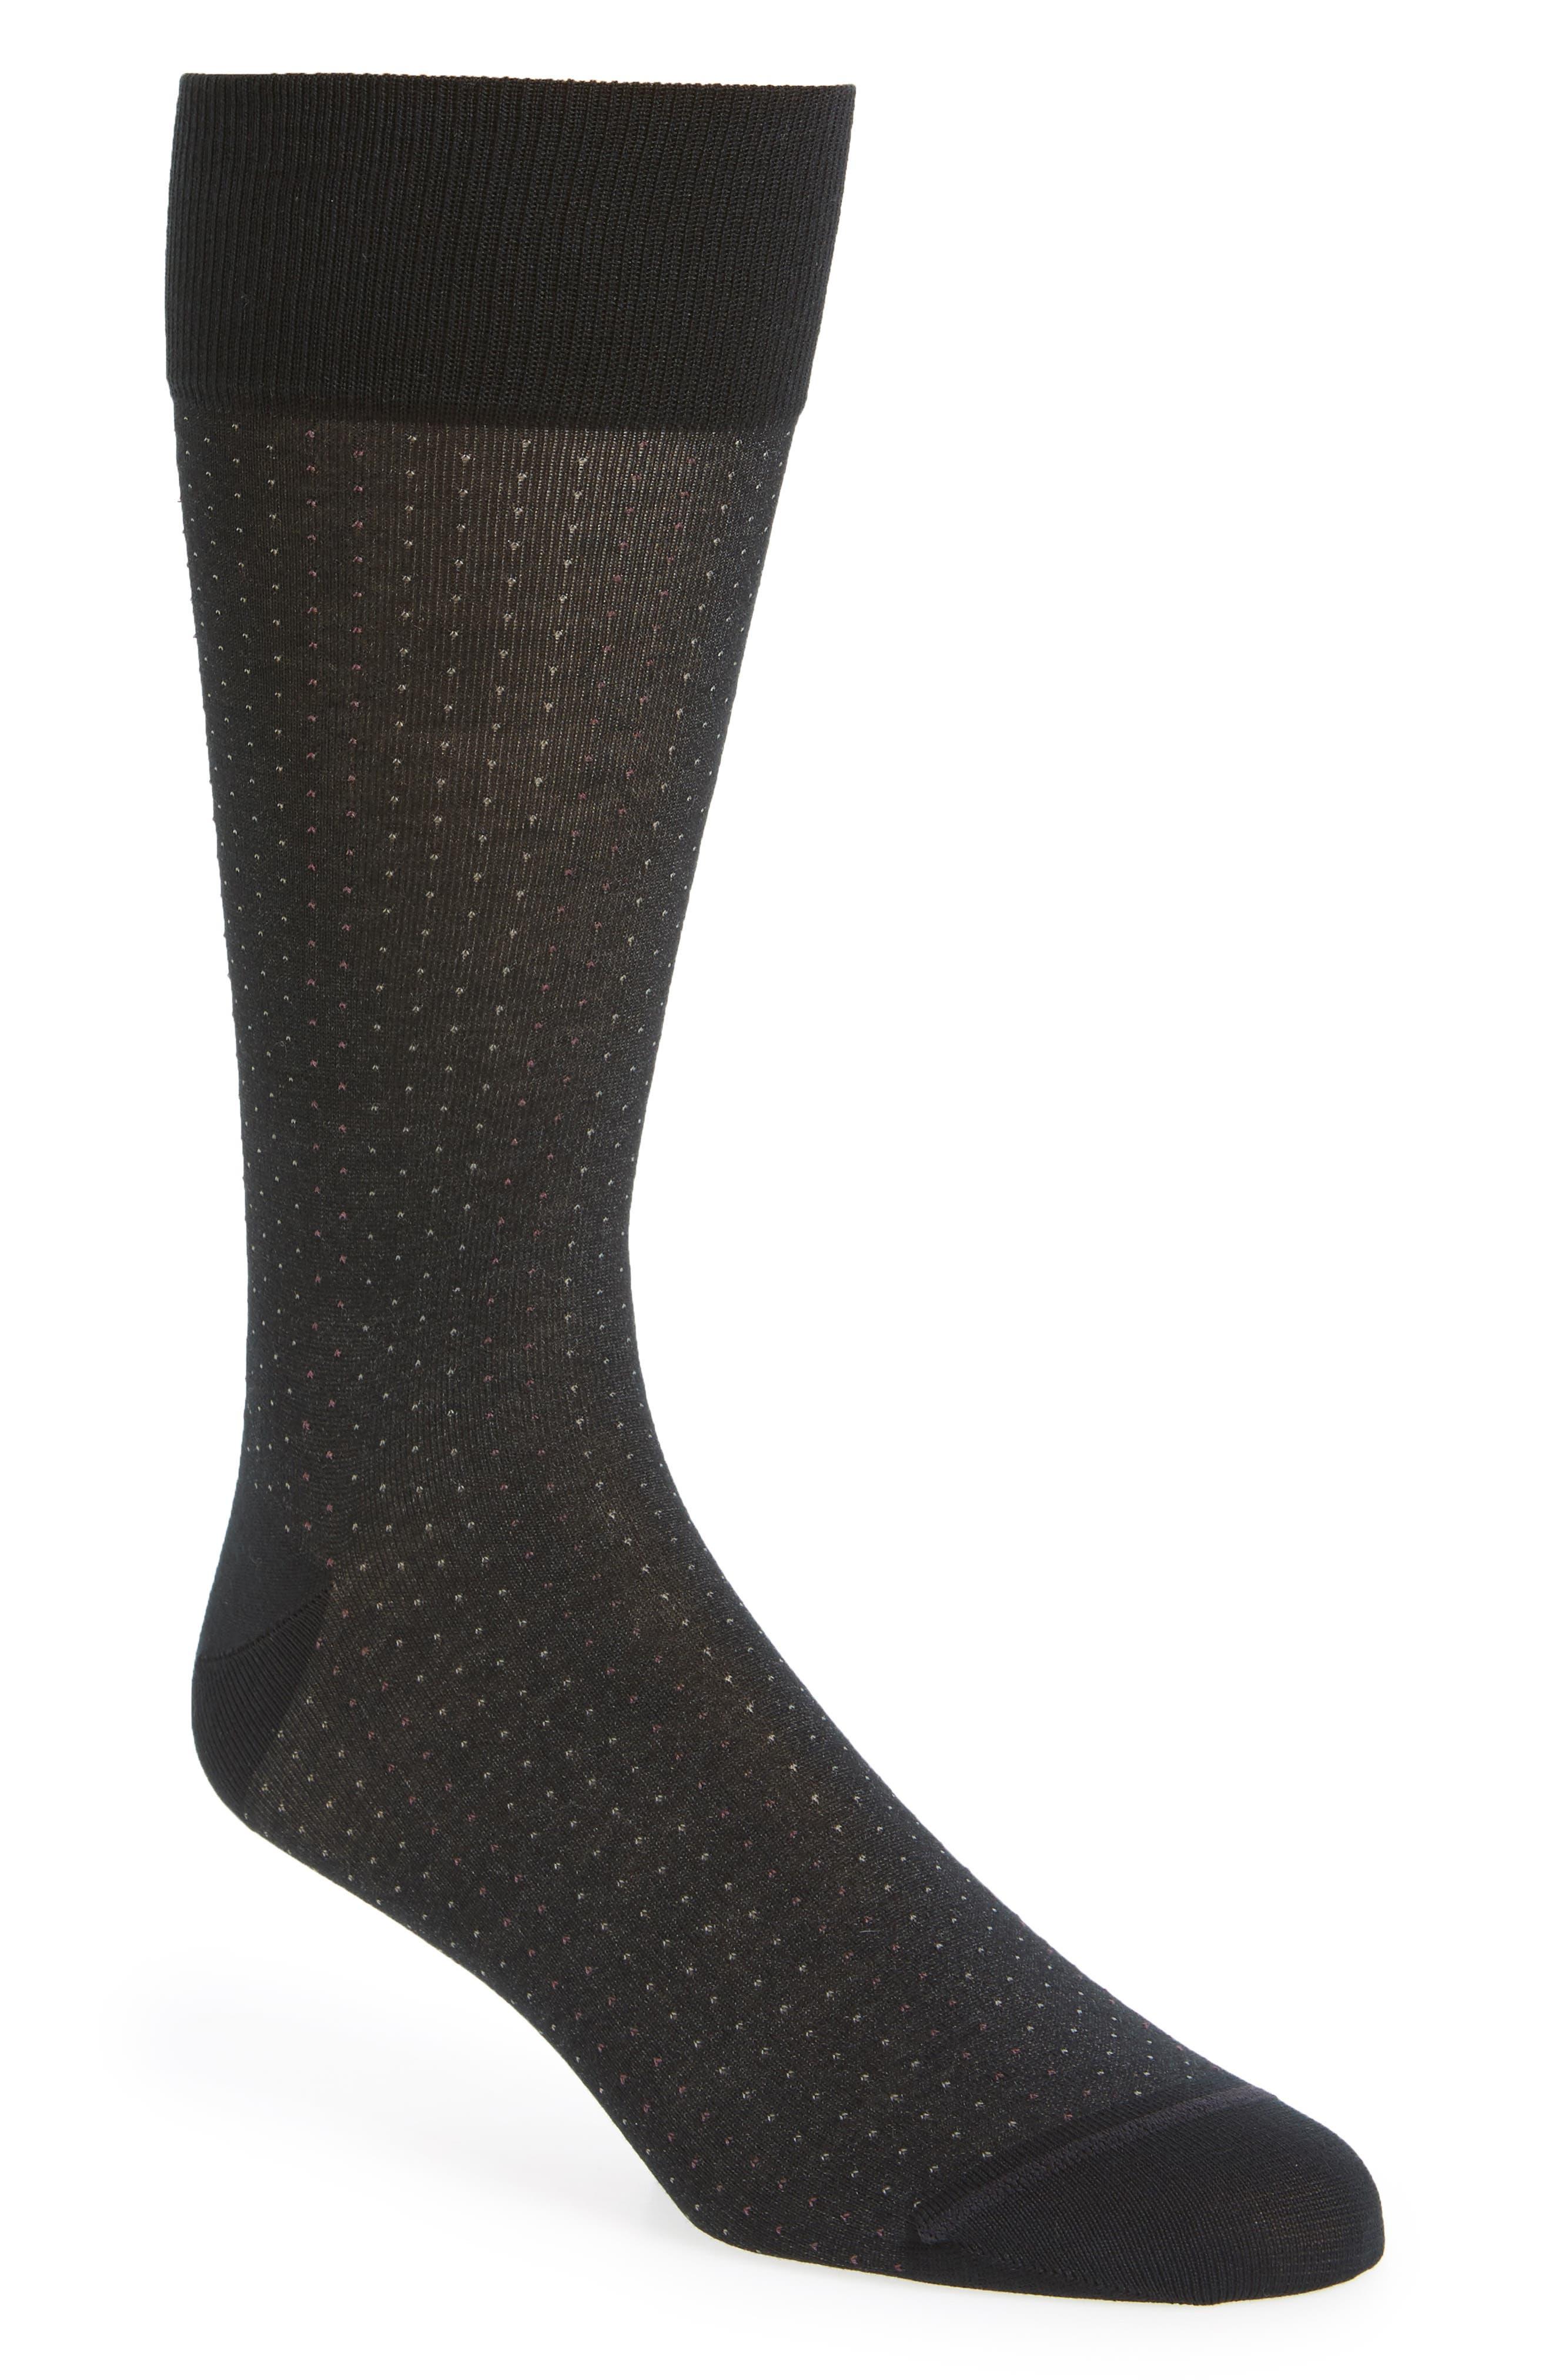 Birdseye Socks,                         Main,                         color, 001